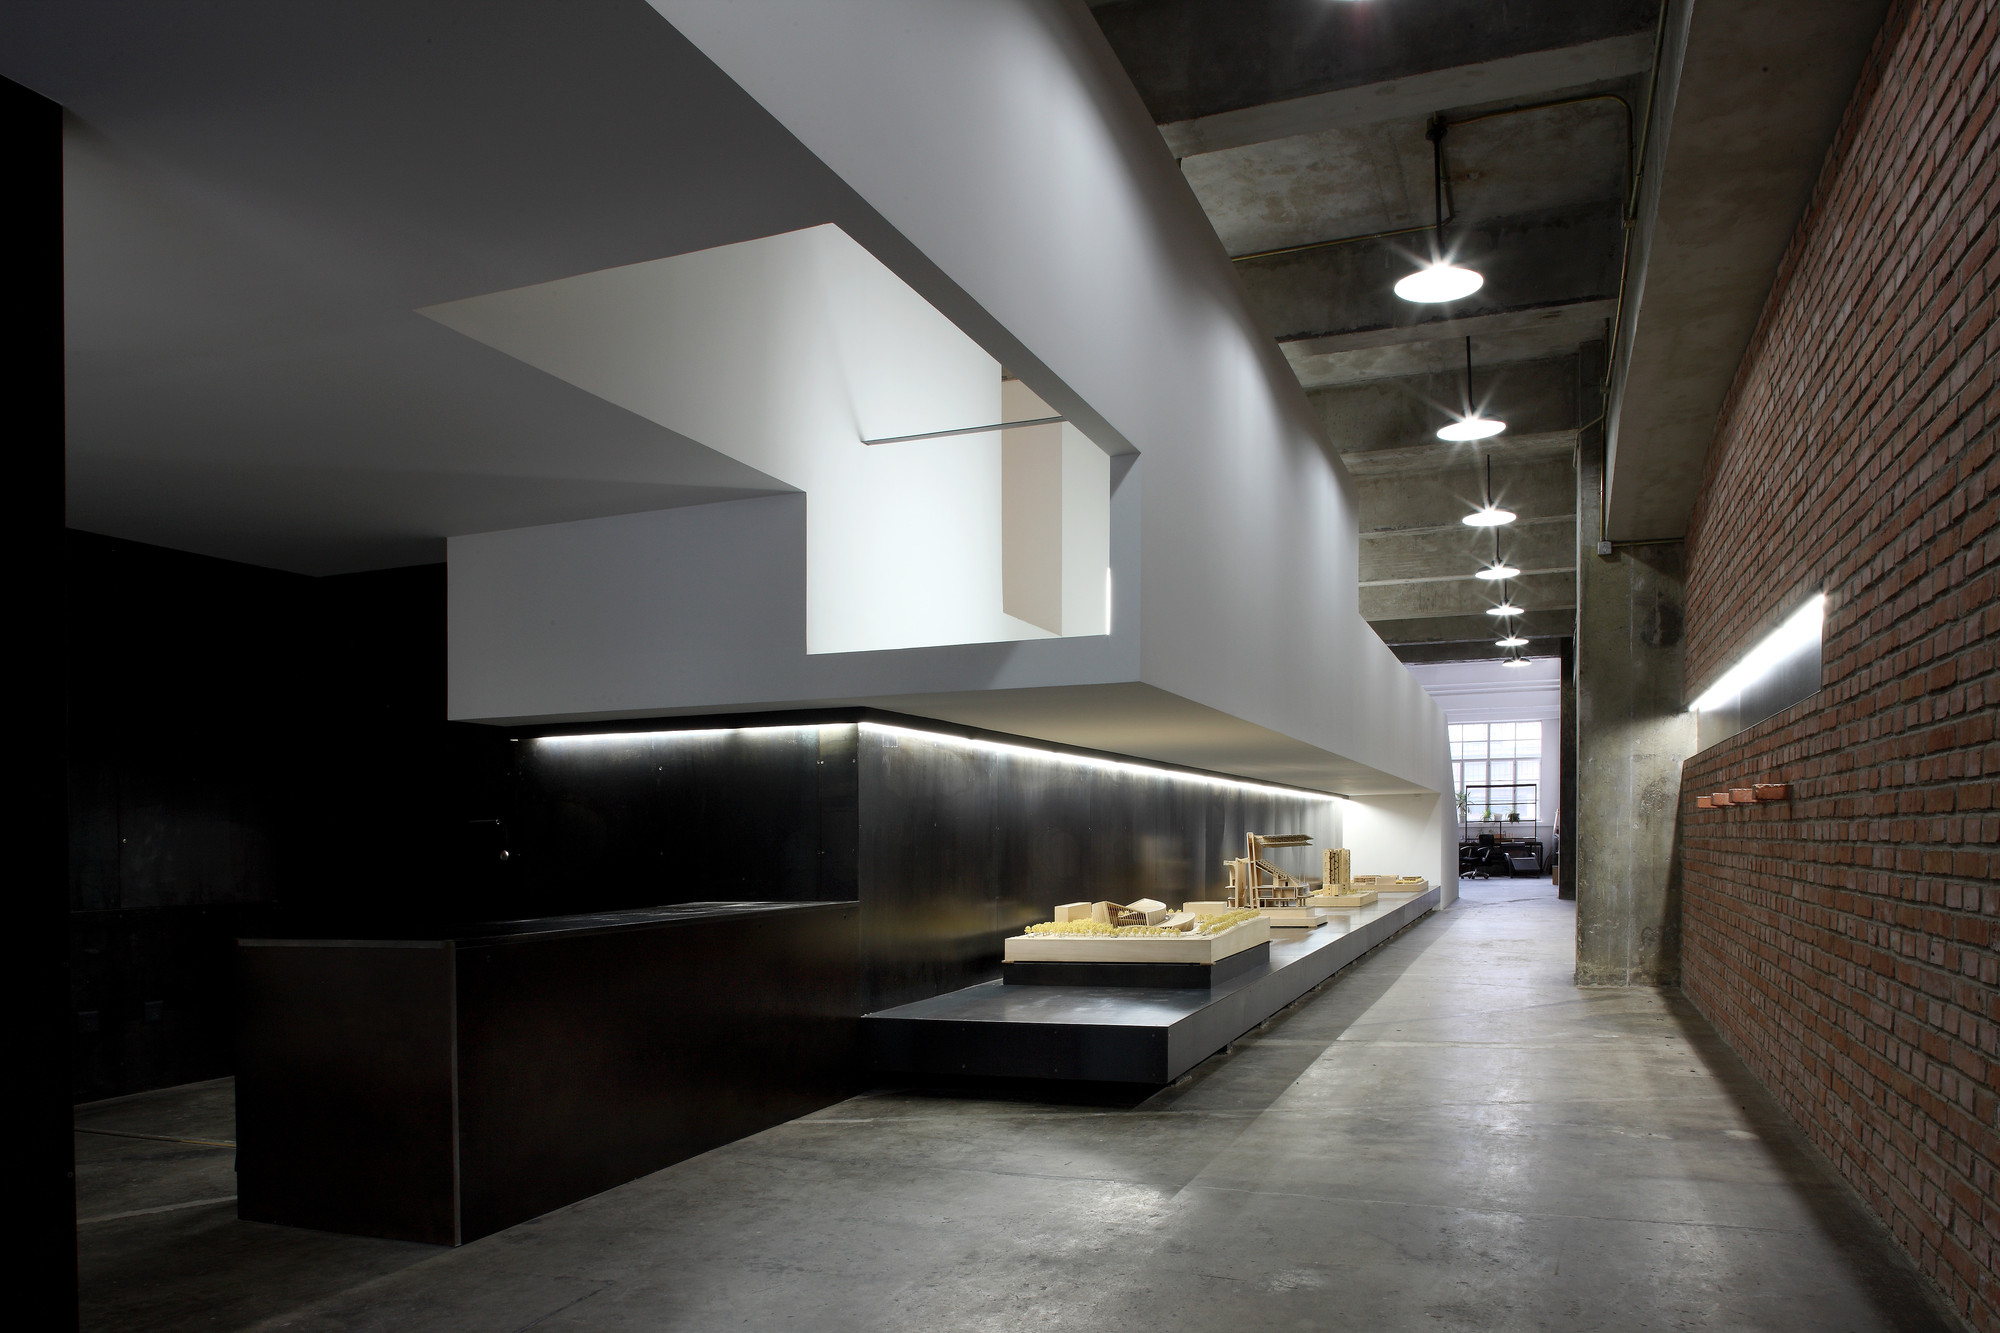 Architecture Office refurbishment of a warehouse / tao - trace architecture office